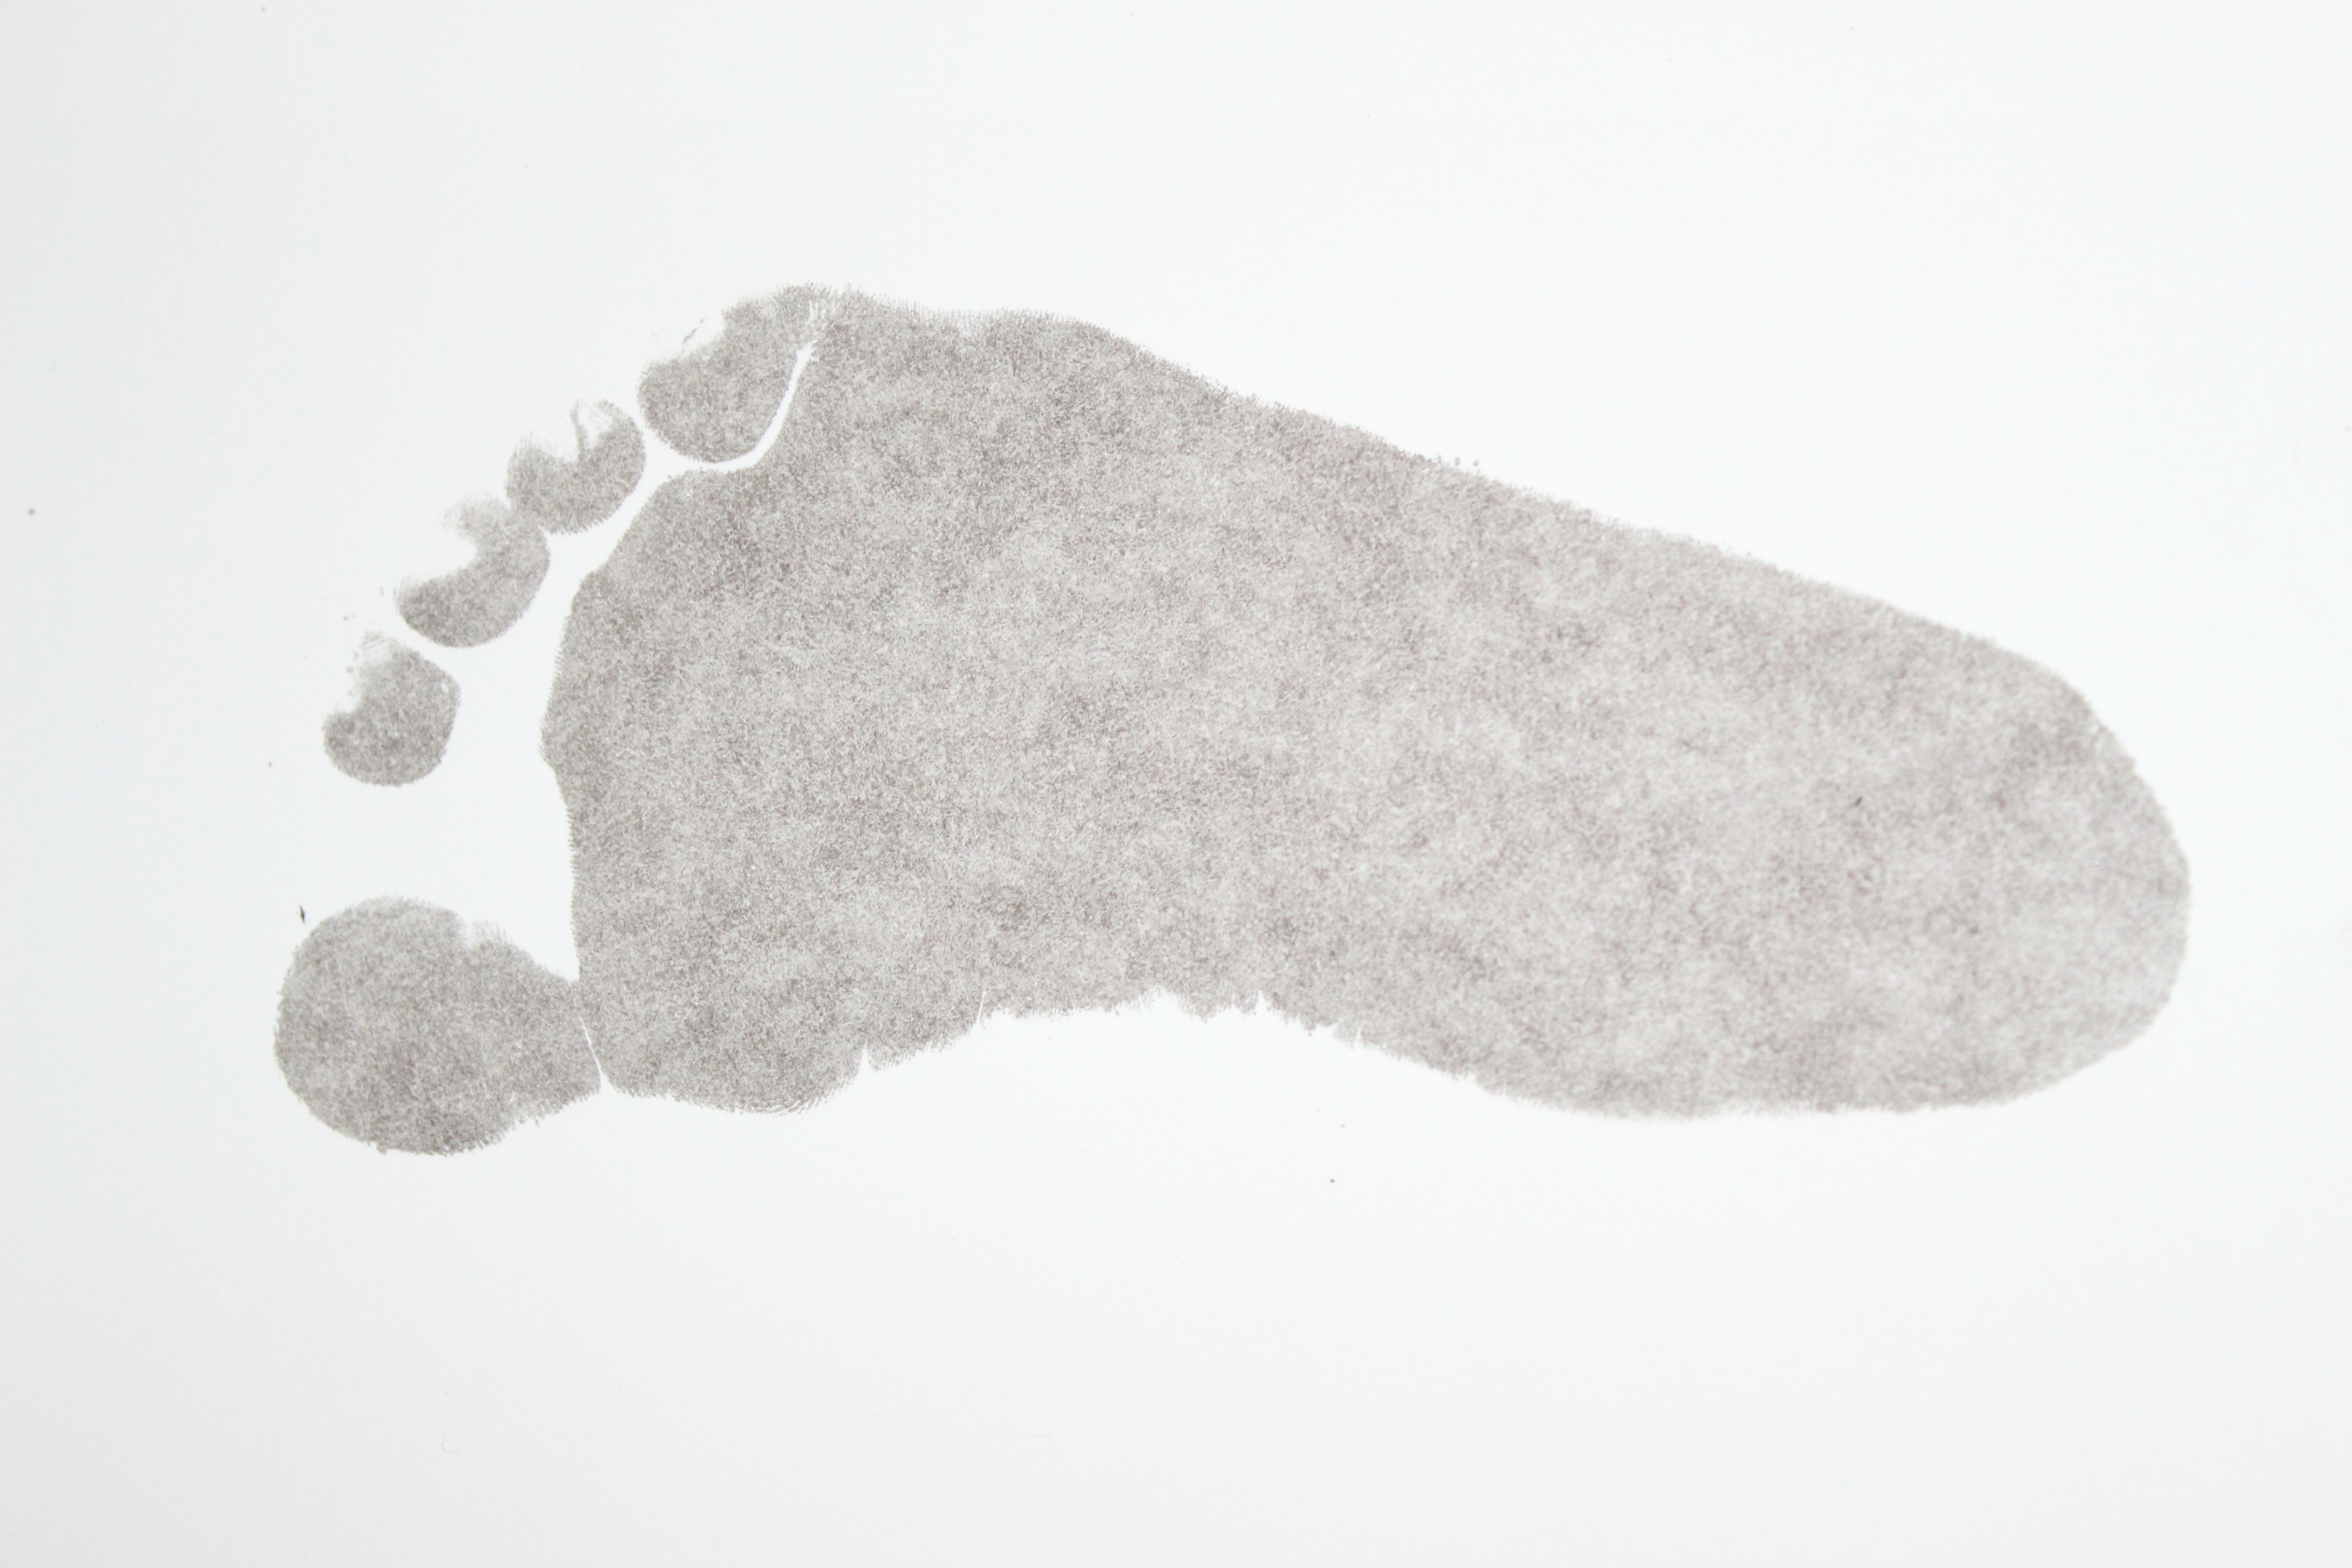 smallprint1